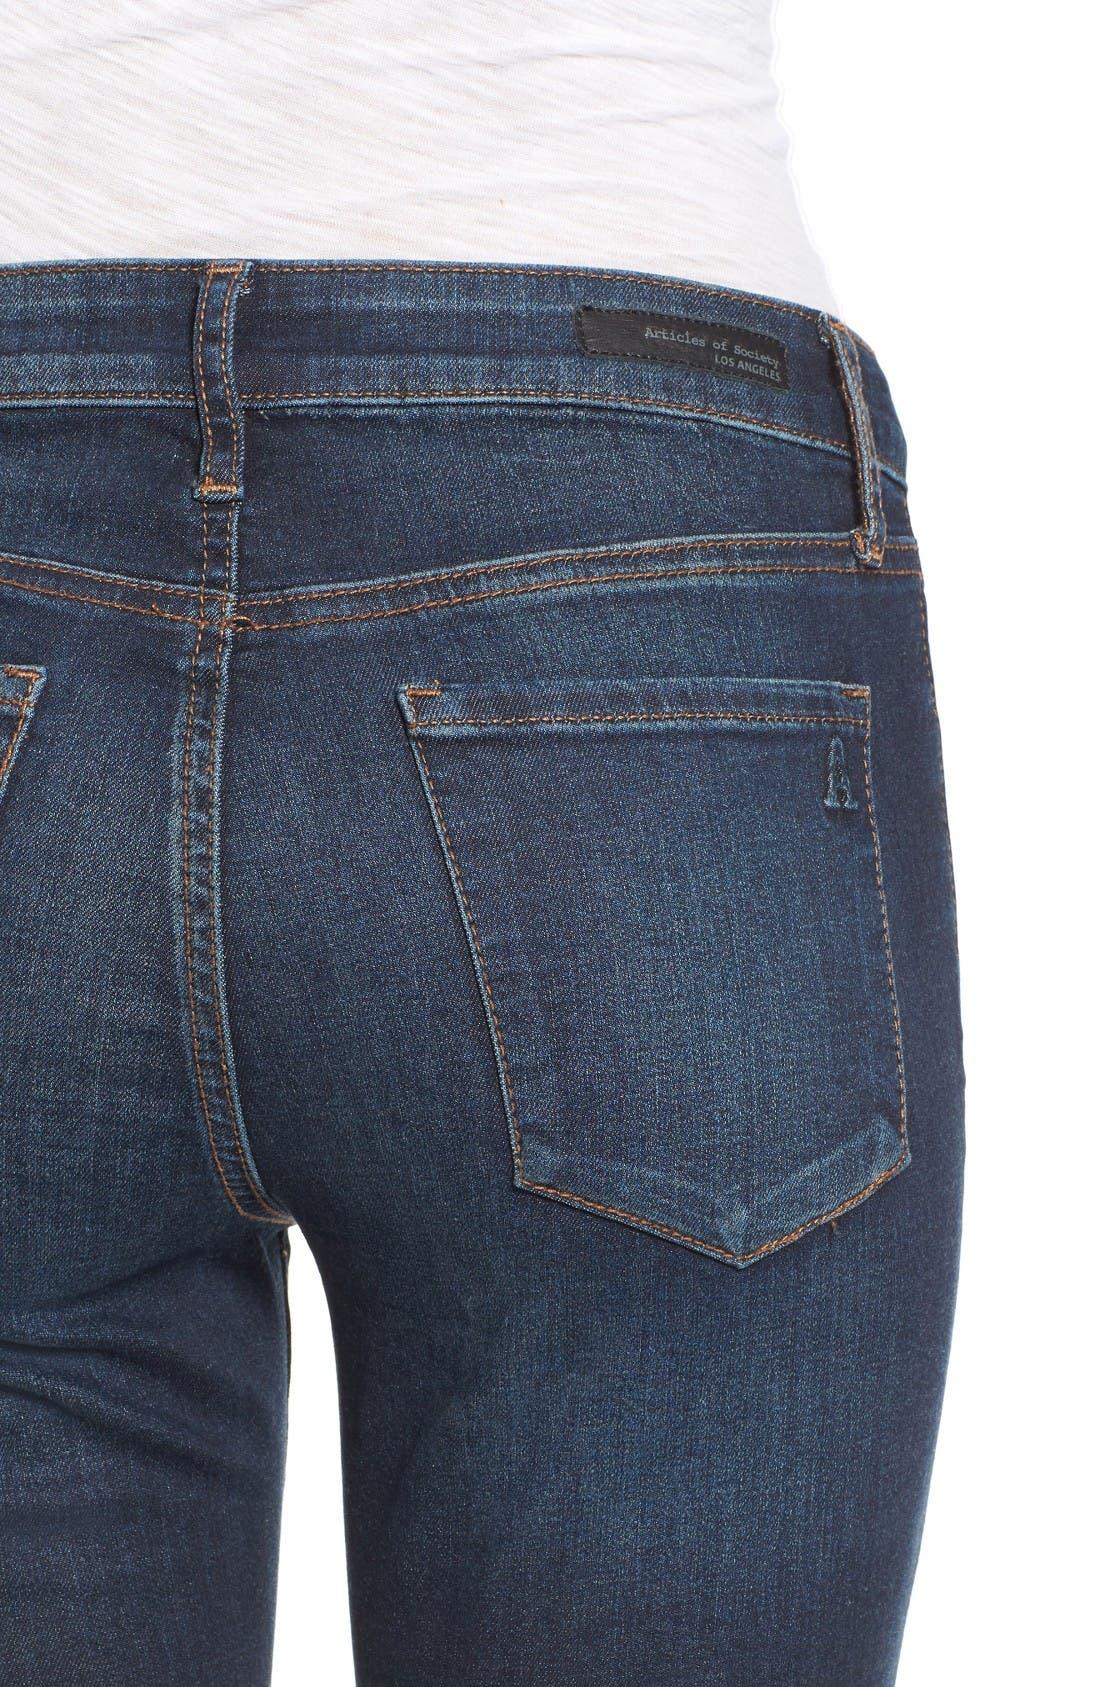 Alternate Image 4  - Articles of Society Mya Skinny Jeans (Waverly)